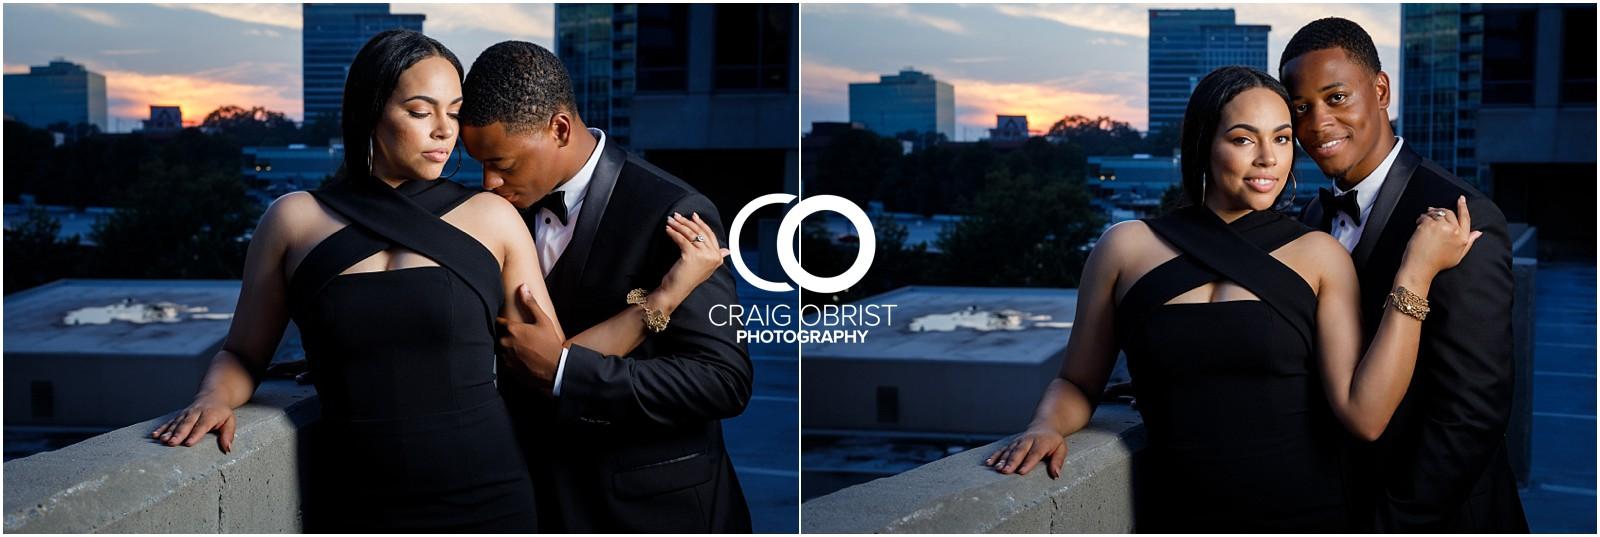 Callanwolde Fine Arts Center Downtown Atlanta Engagement Portraits_0029.jpg